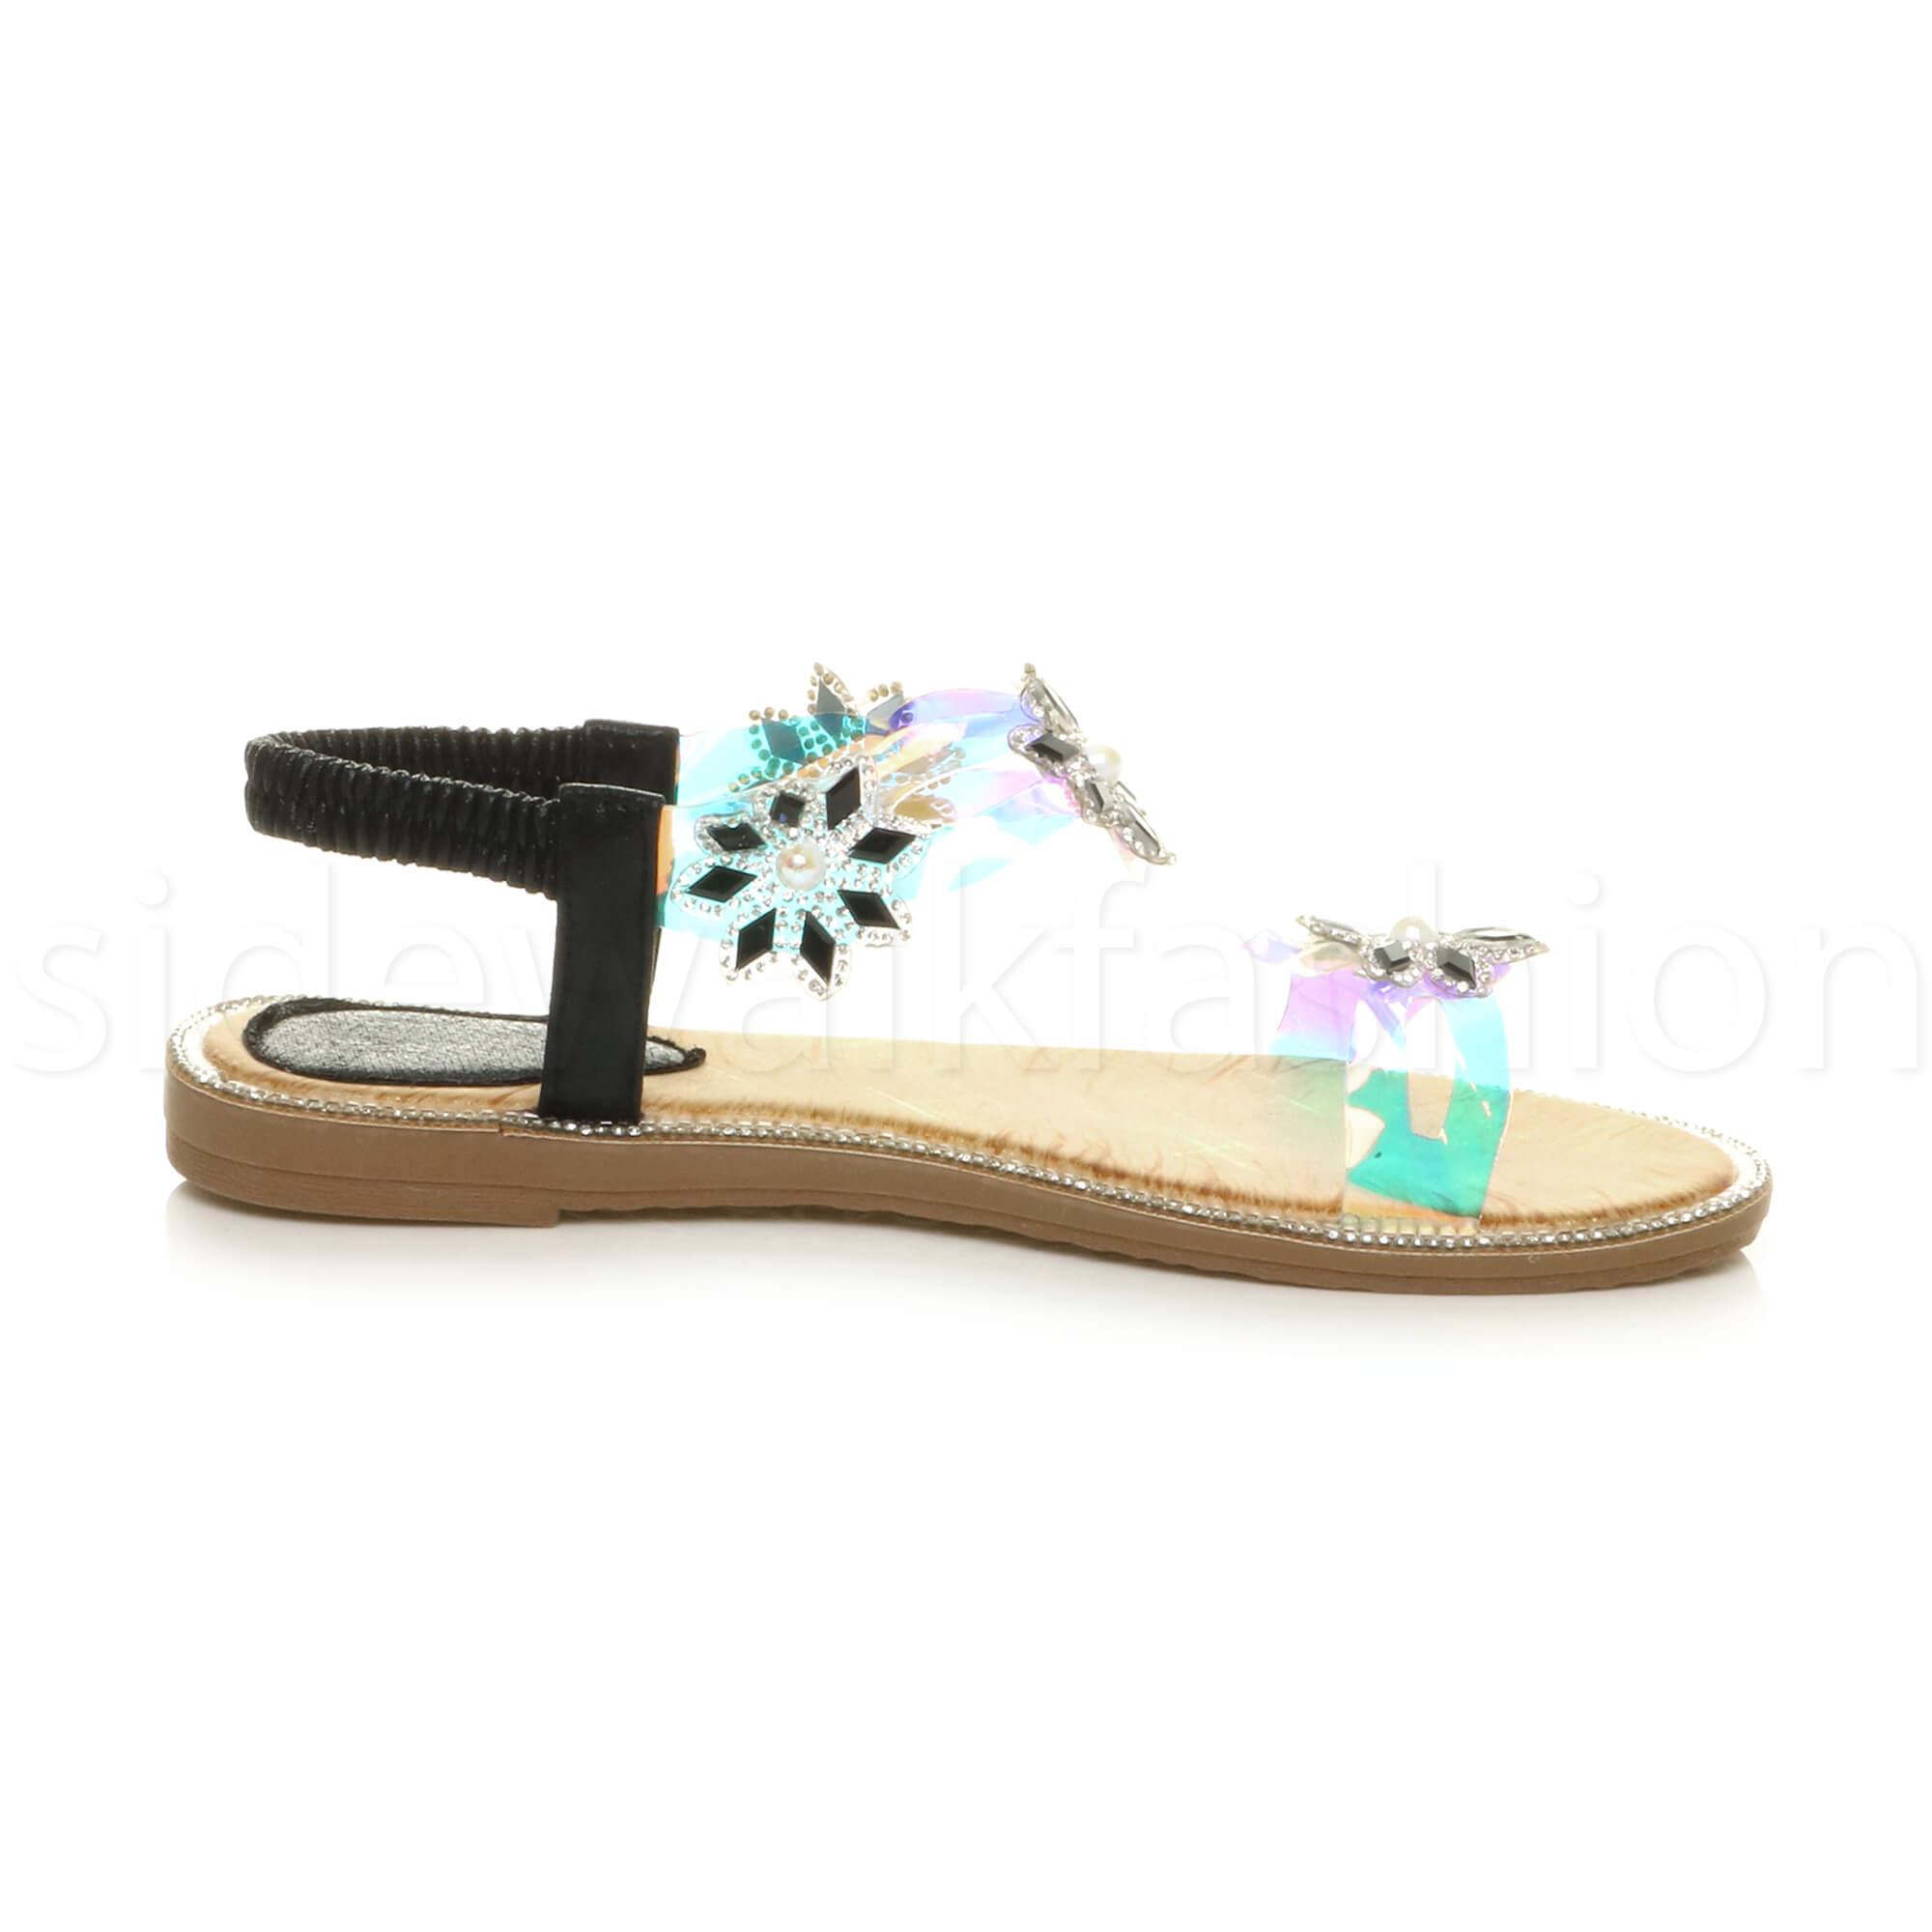 Womens ladies slingback diamante flower clear iridescent T-bar sandals size